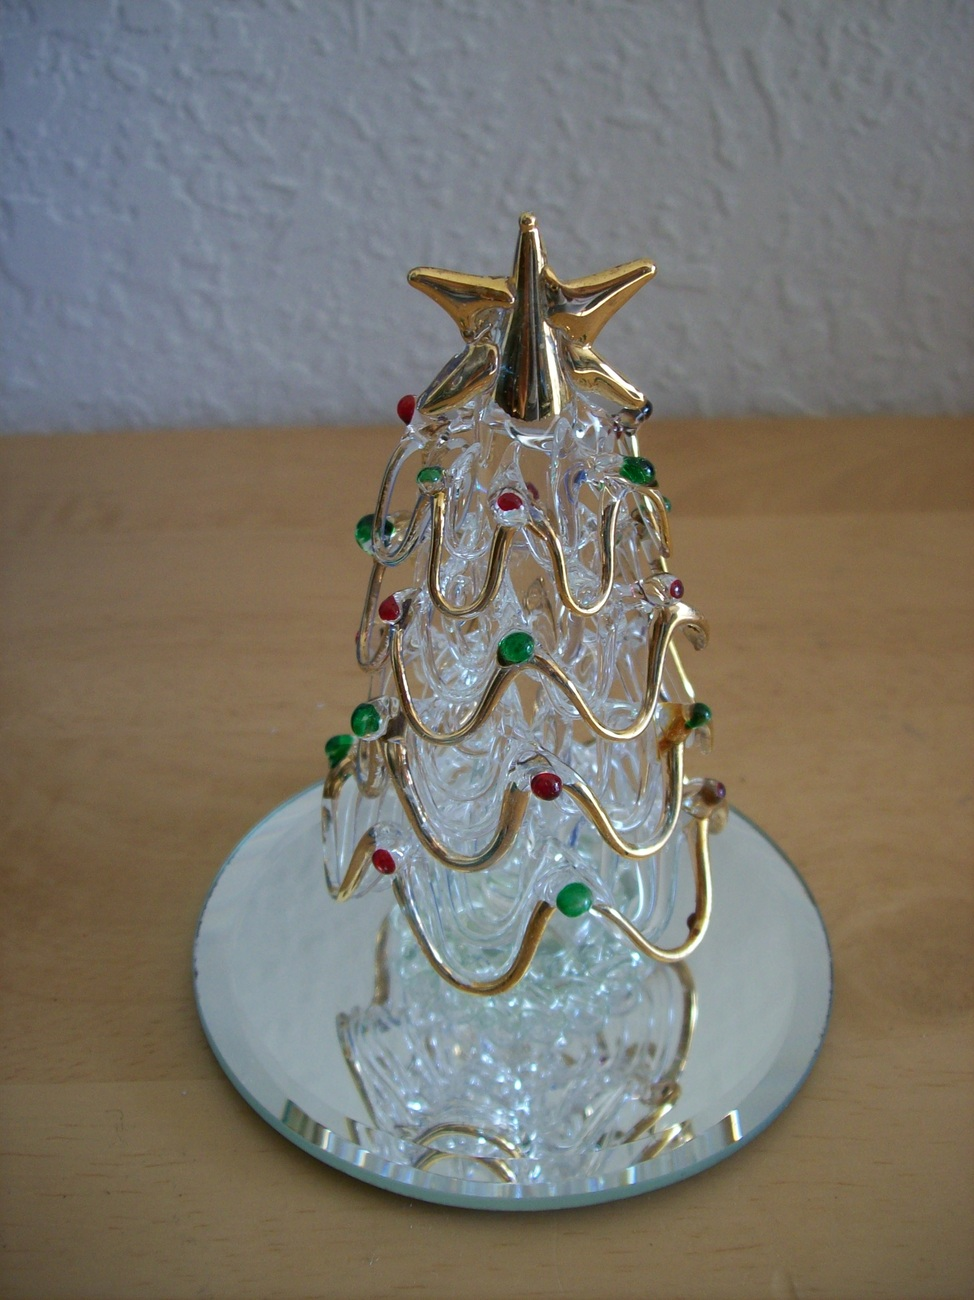 Spun Glass Christmas Tree Figurine